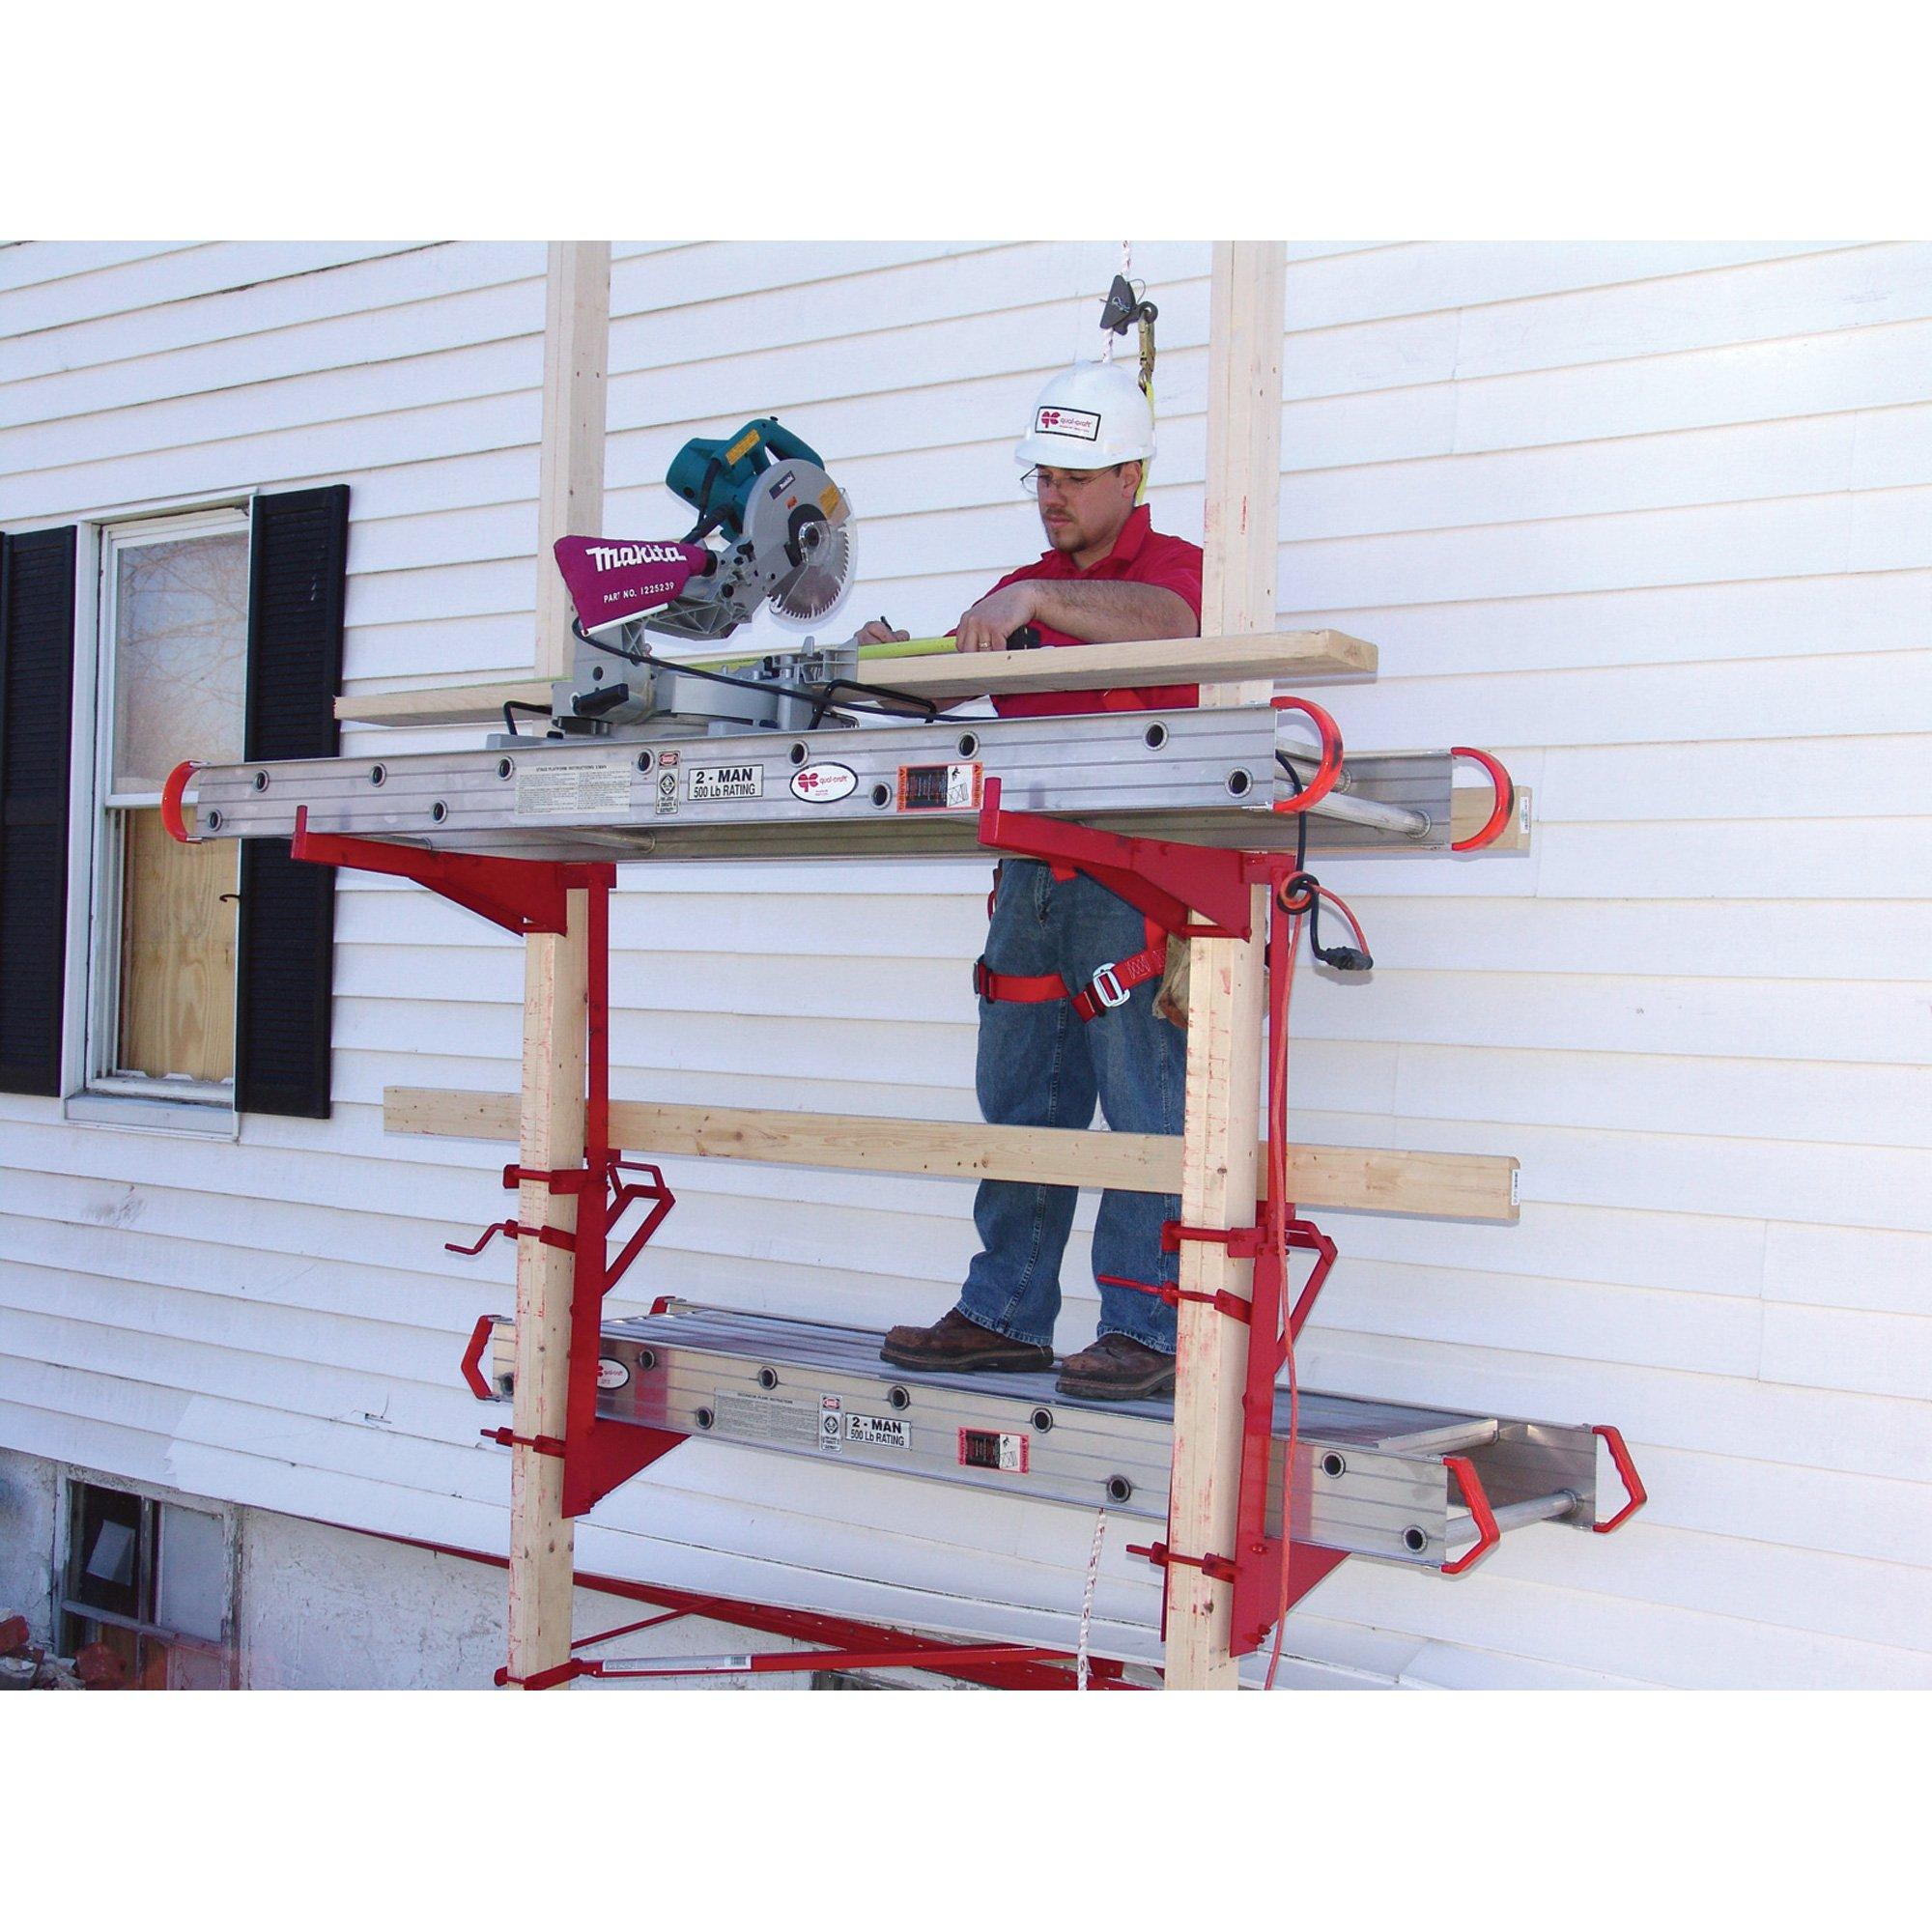 Qual-Craft Steel Pump Jack System Kit - 500-Lb. Capacity, Model# 2214